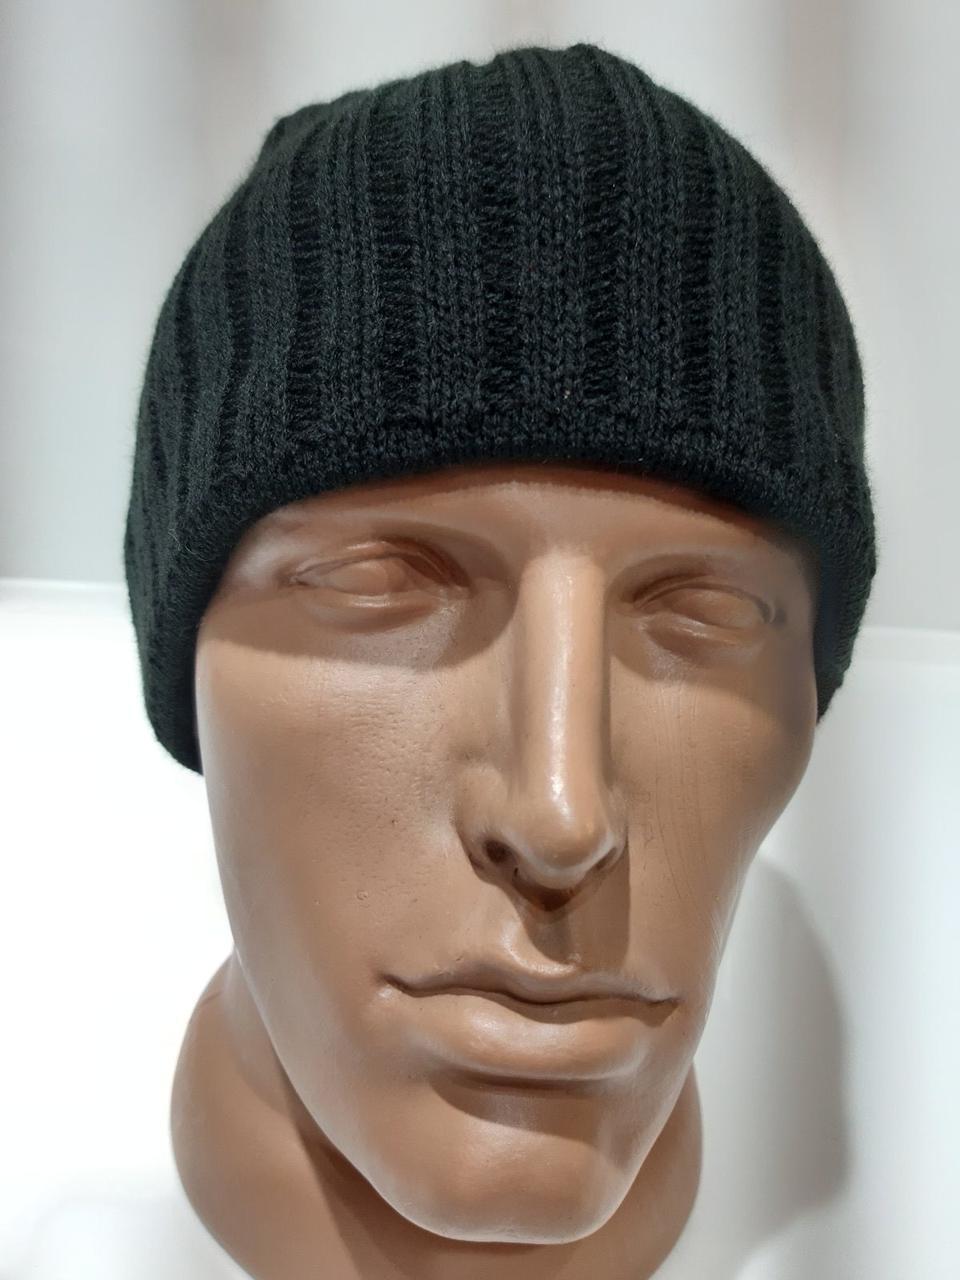 Мужская шапка зимняя вязаная на флисе черная